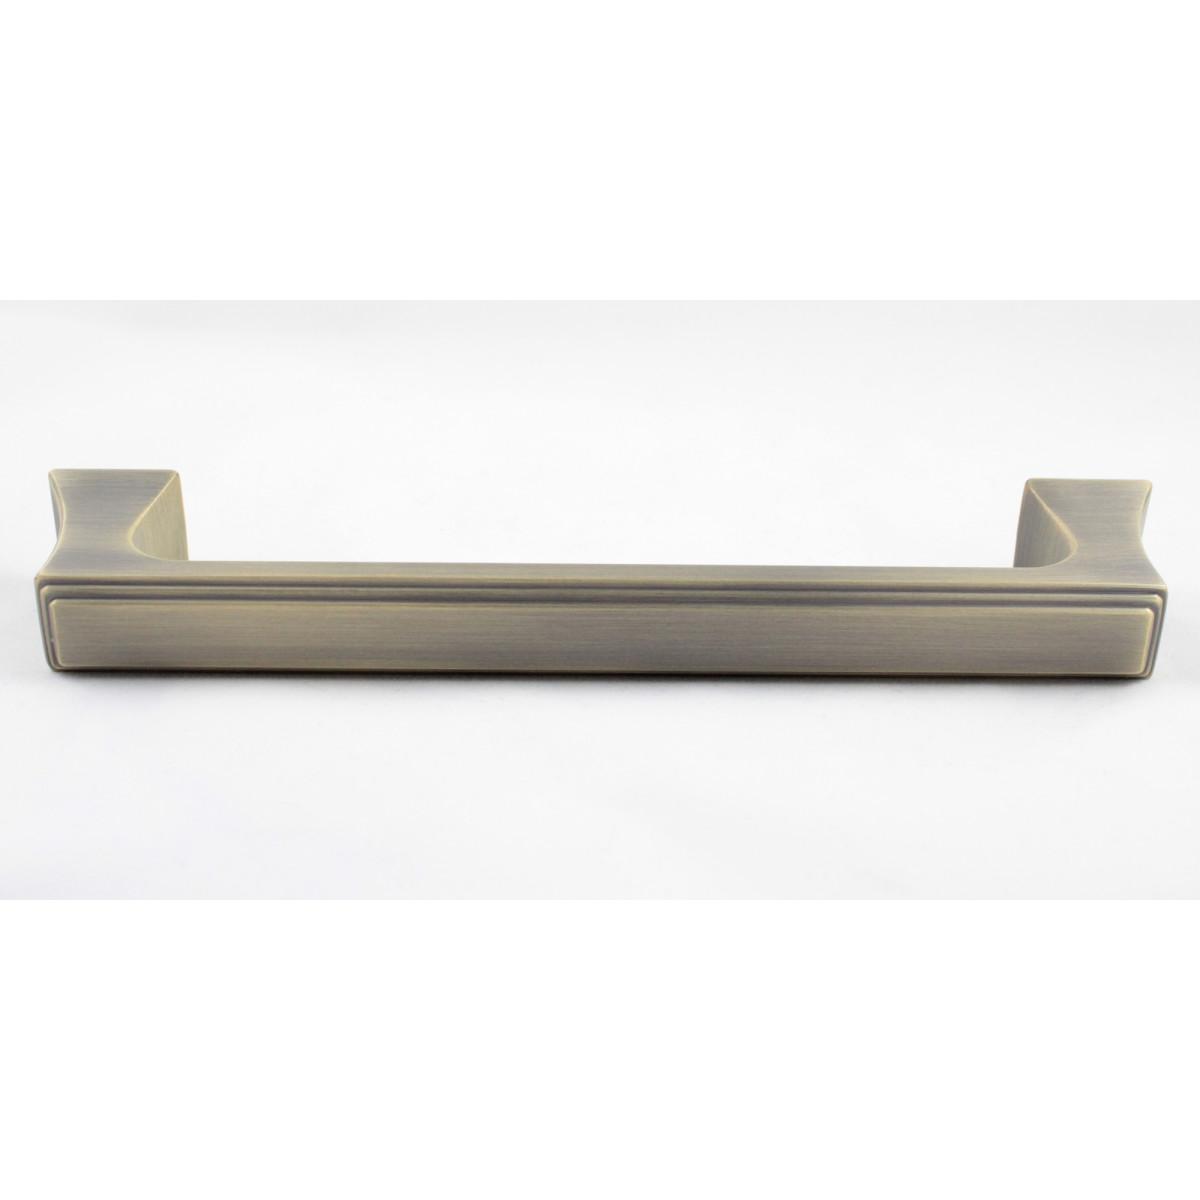 Ручка-Скоба Modda 160 Латунь Бронза Troya-890-14-160